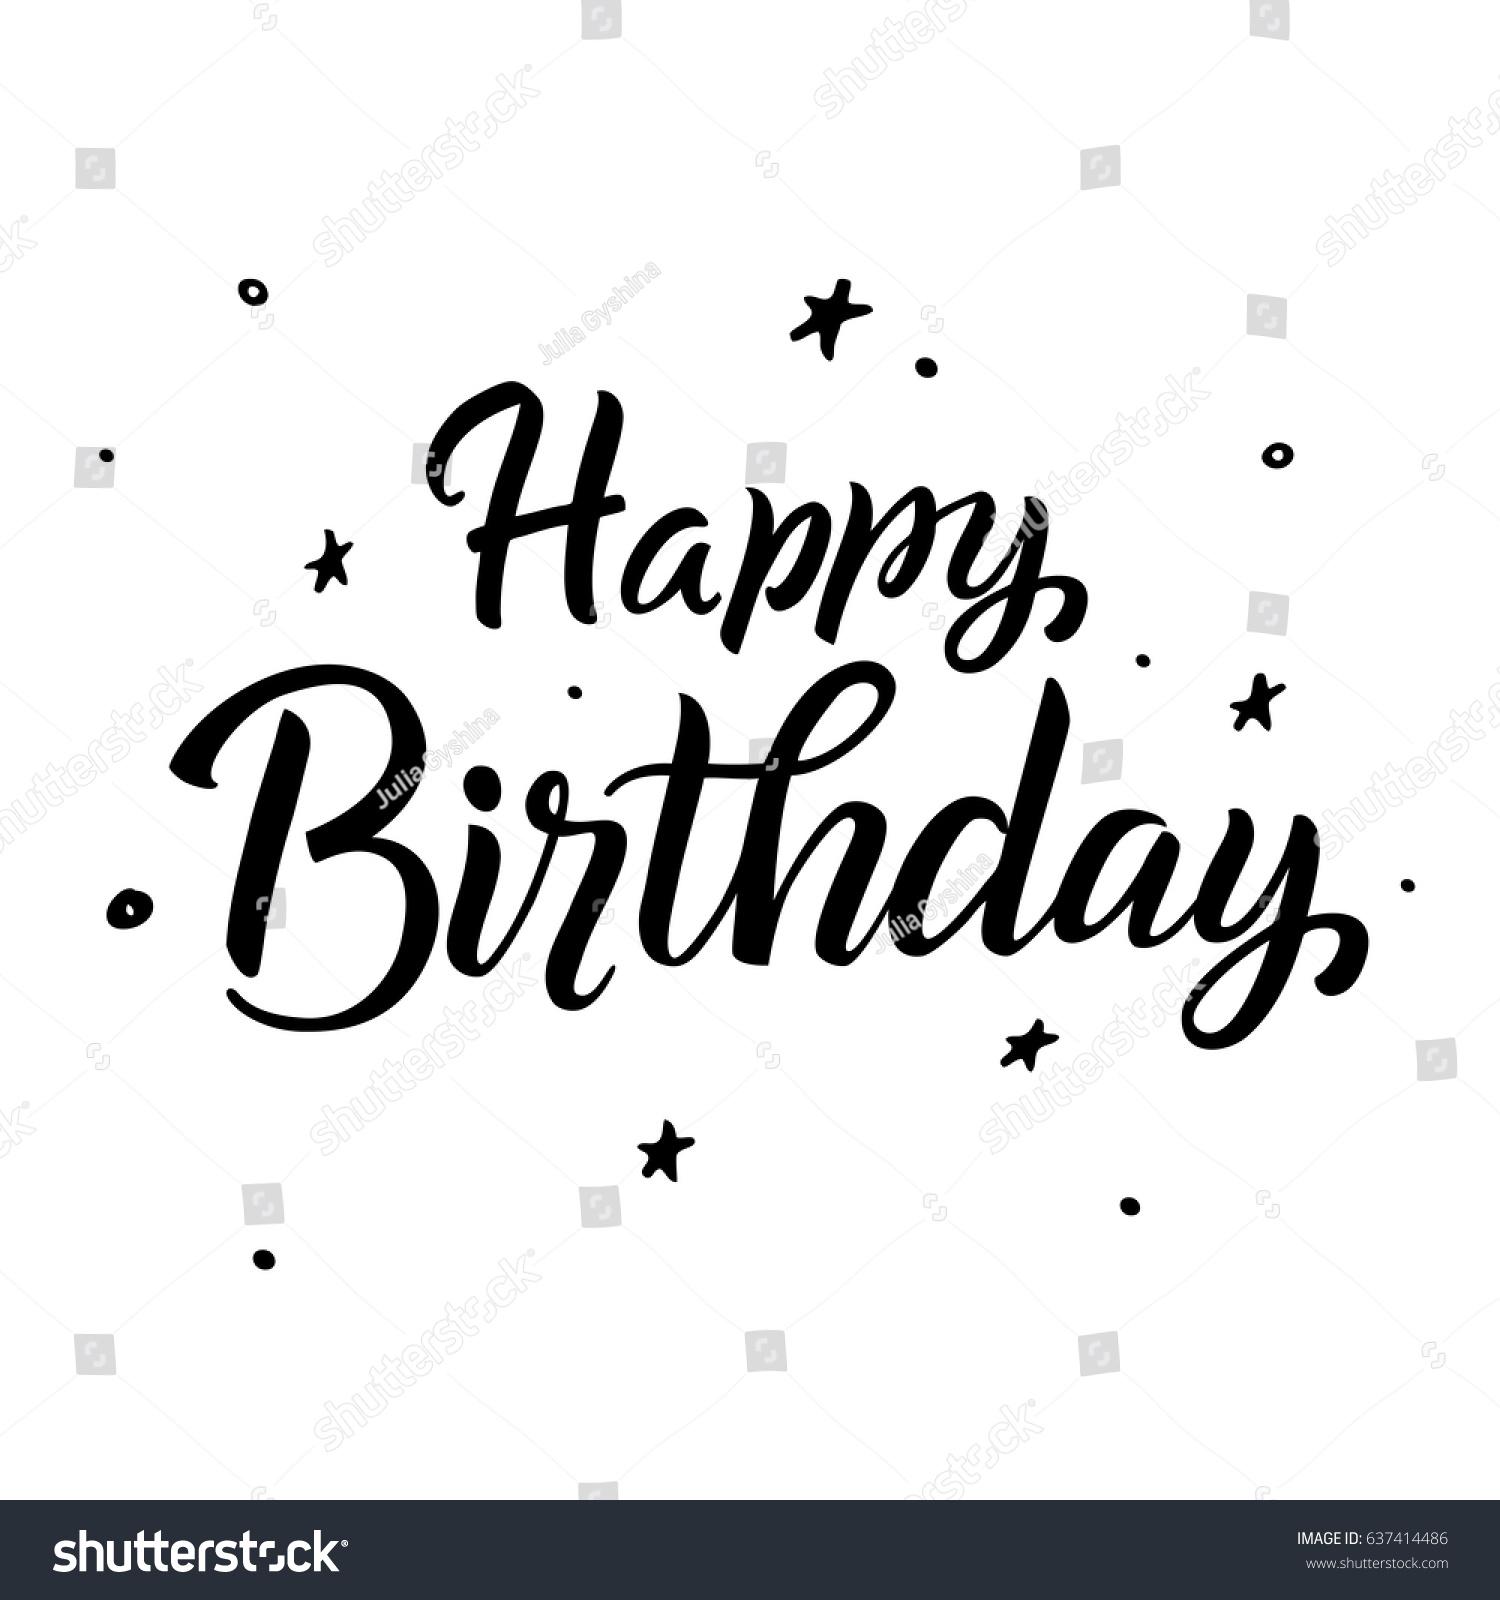 Happy Birthdaygreeting Card Calligraphy Black Text Stock